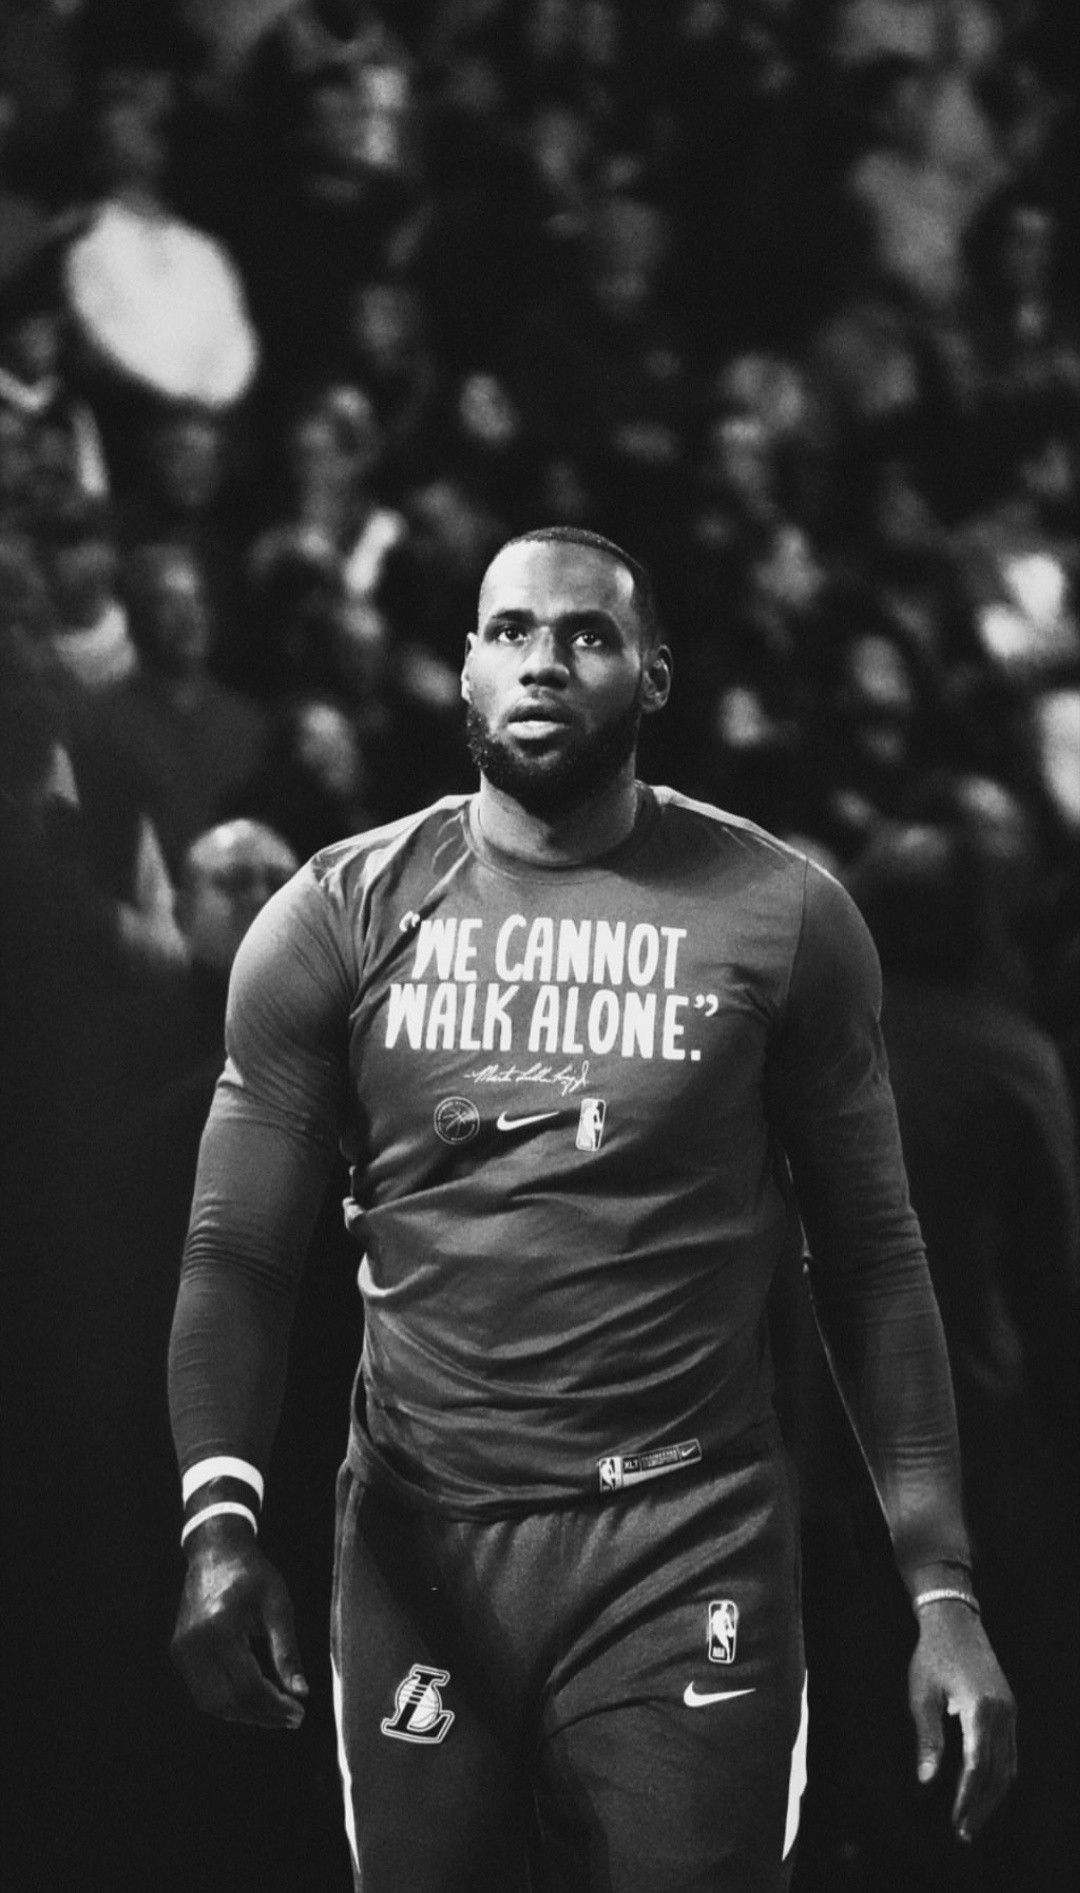 LeBron James wallpaper in 2020 | Lebron